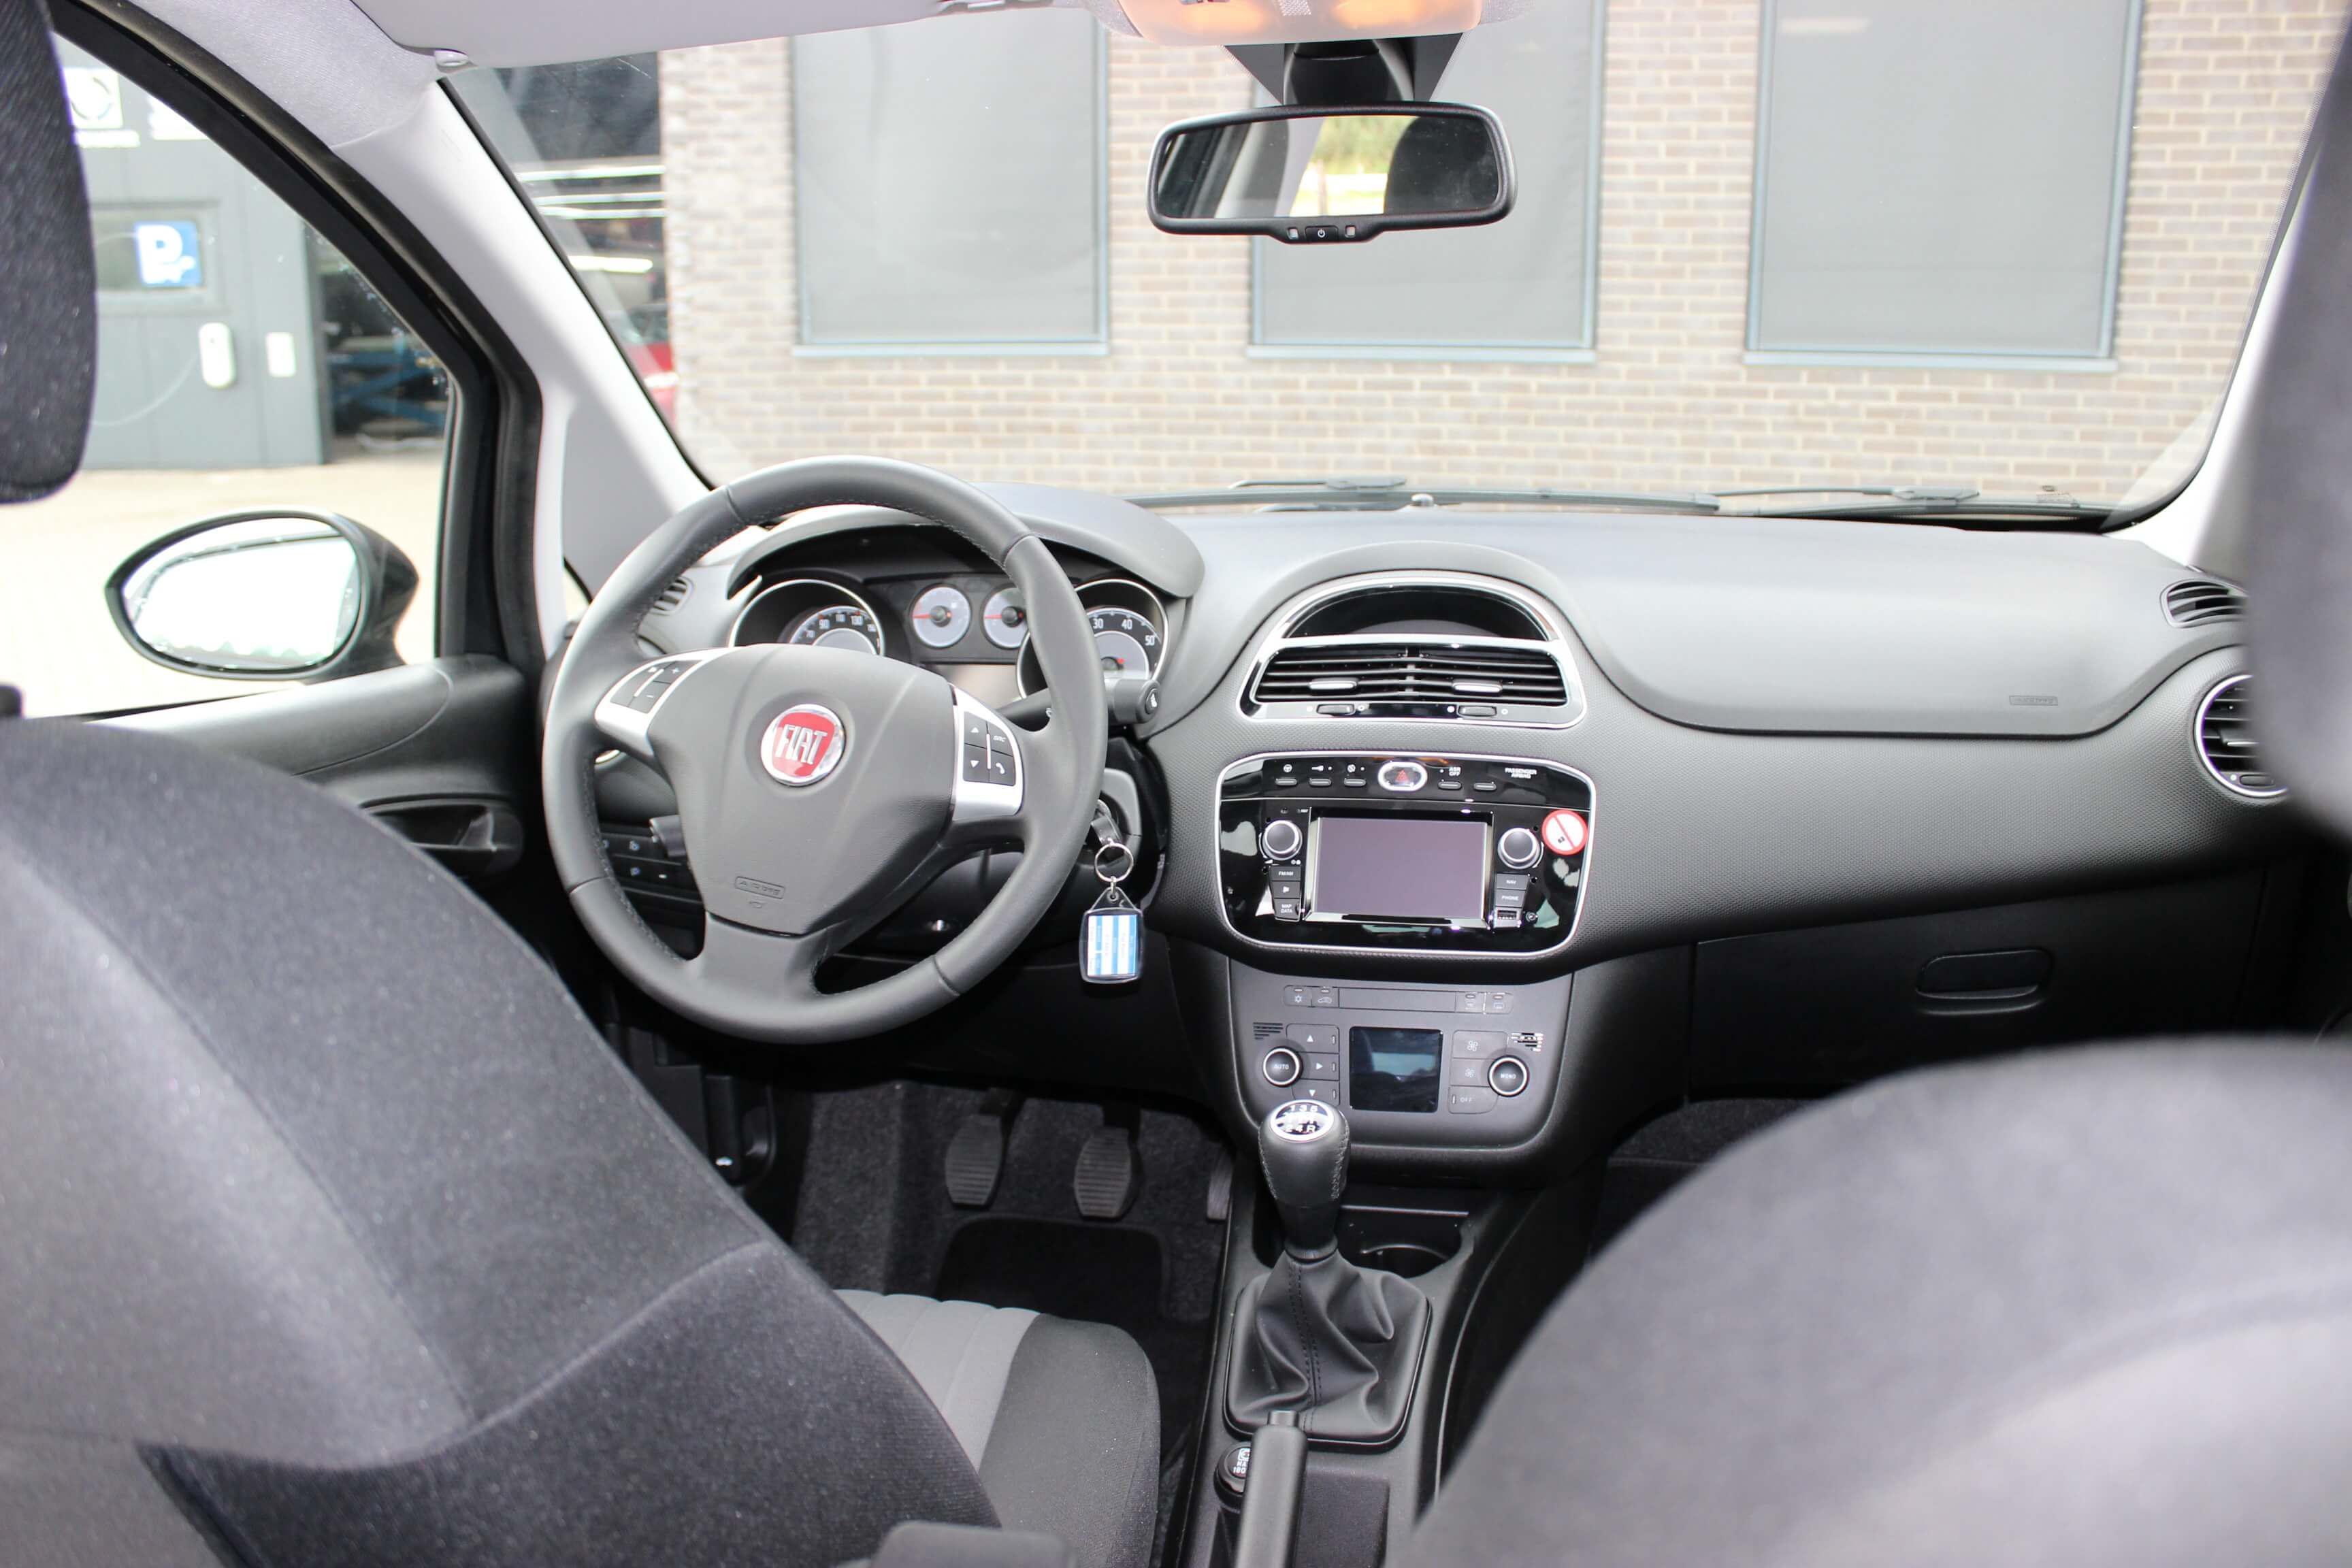 Fiat Punto Evo binnenkant